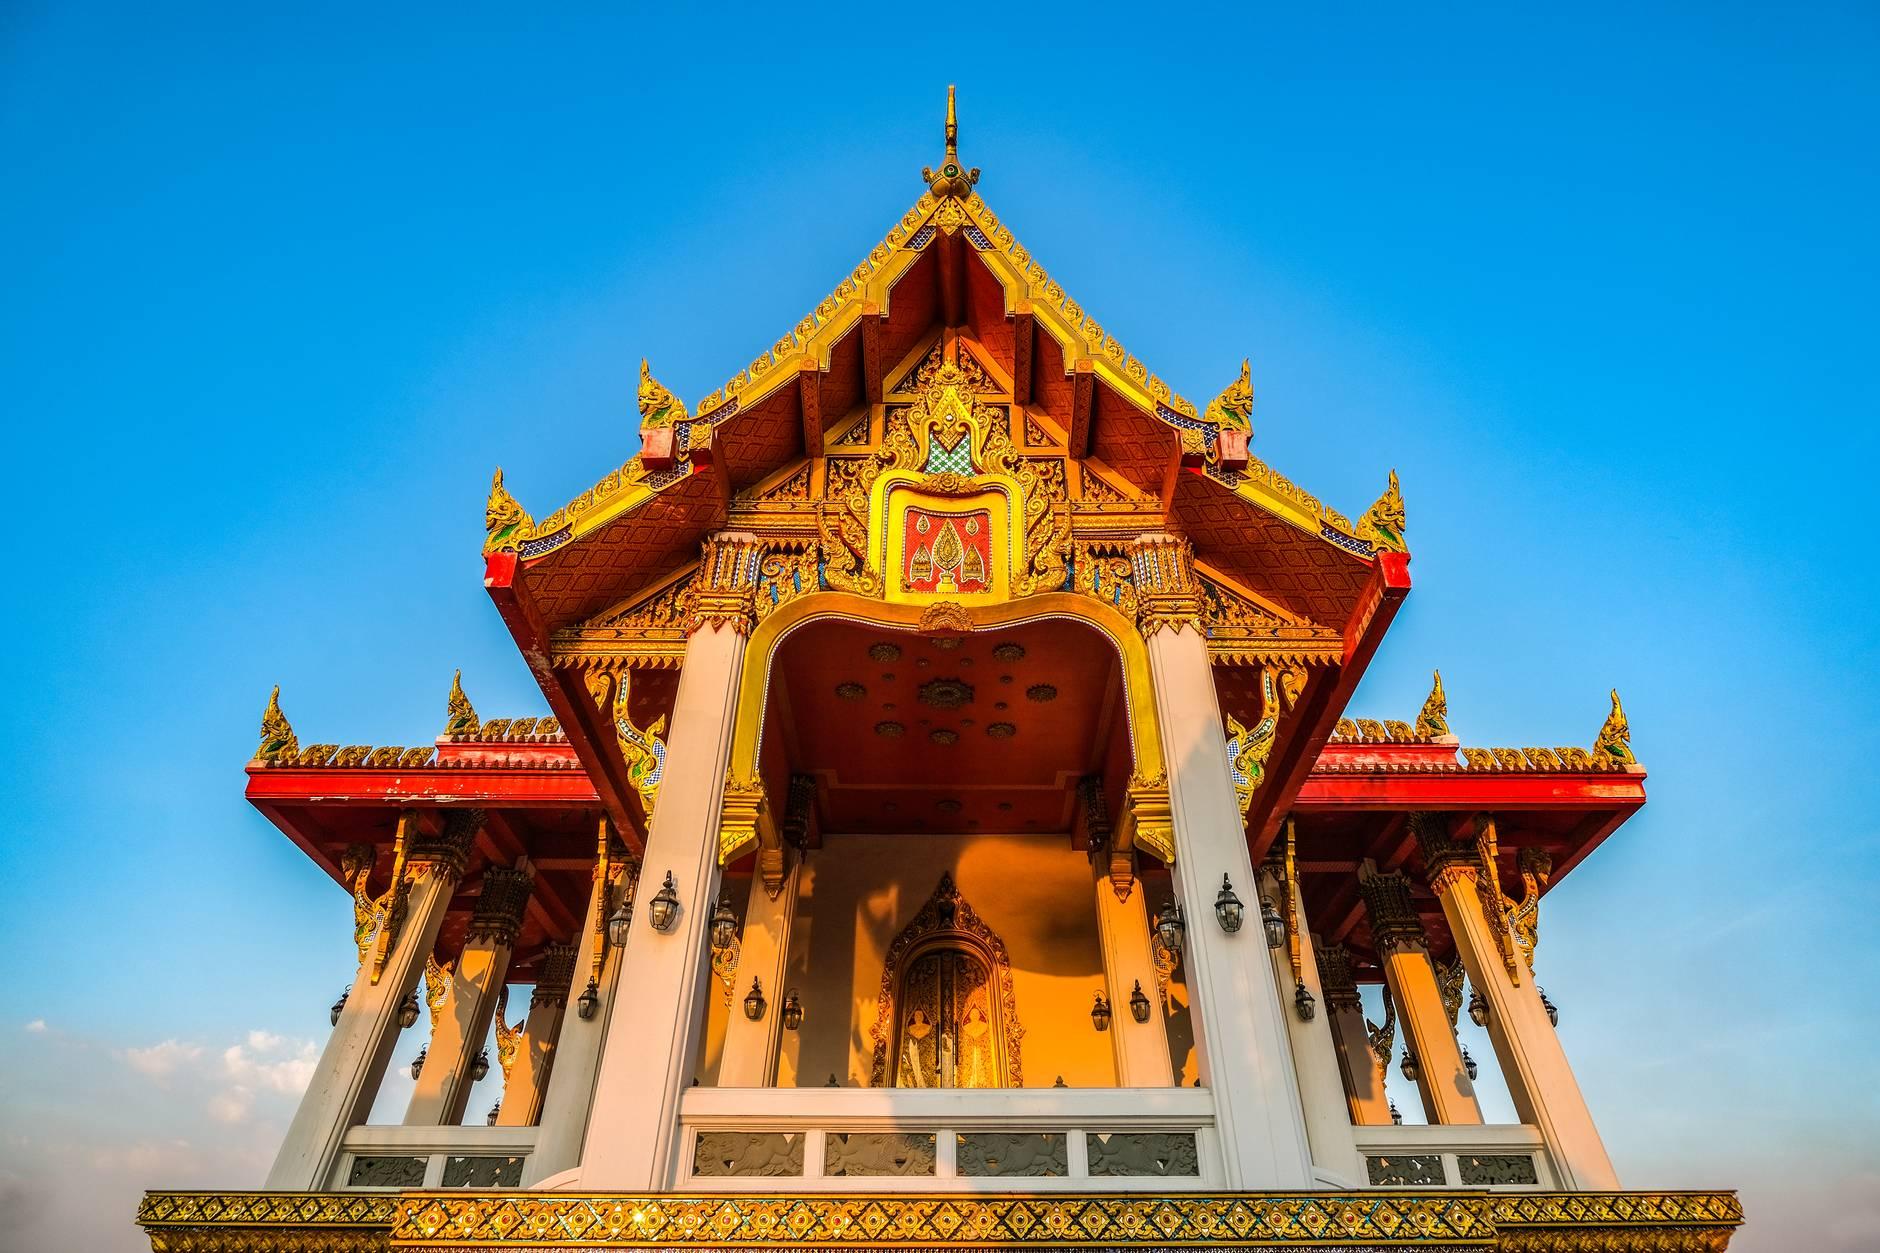 thai temple under blue sky